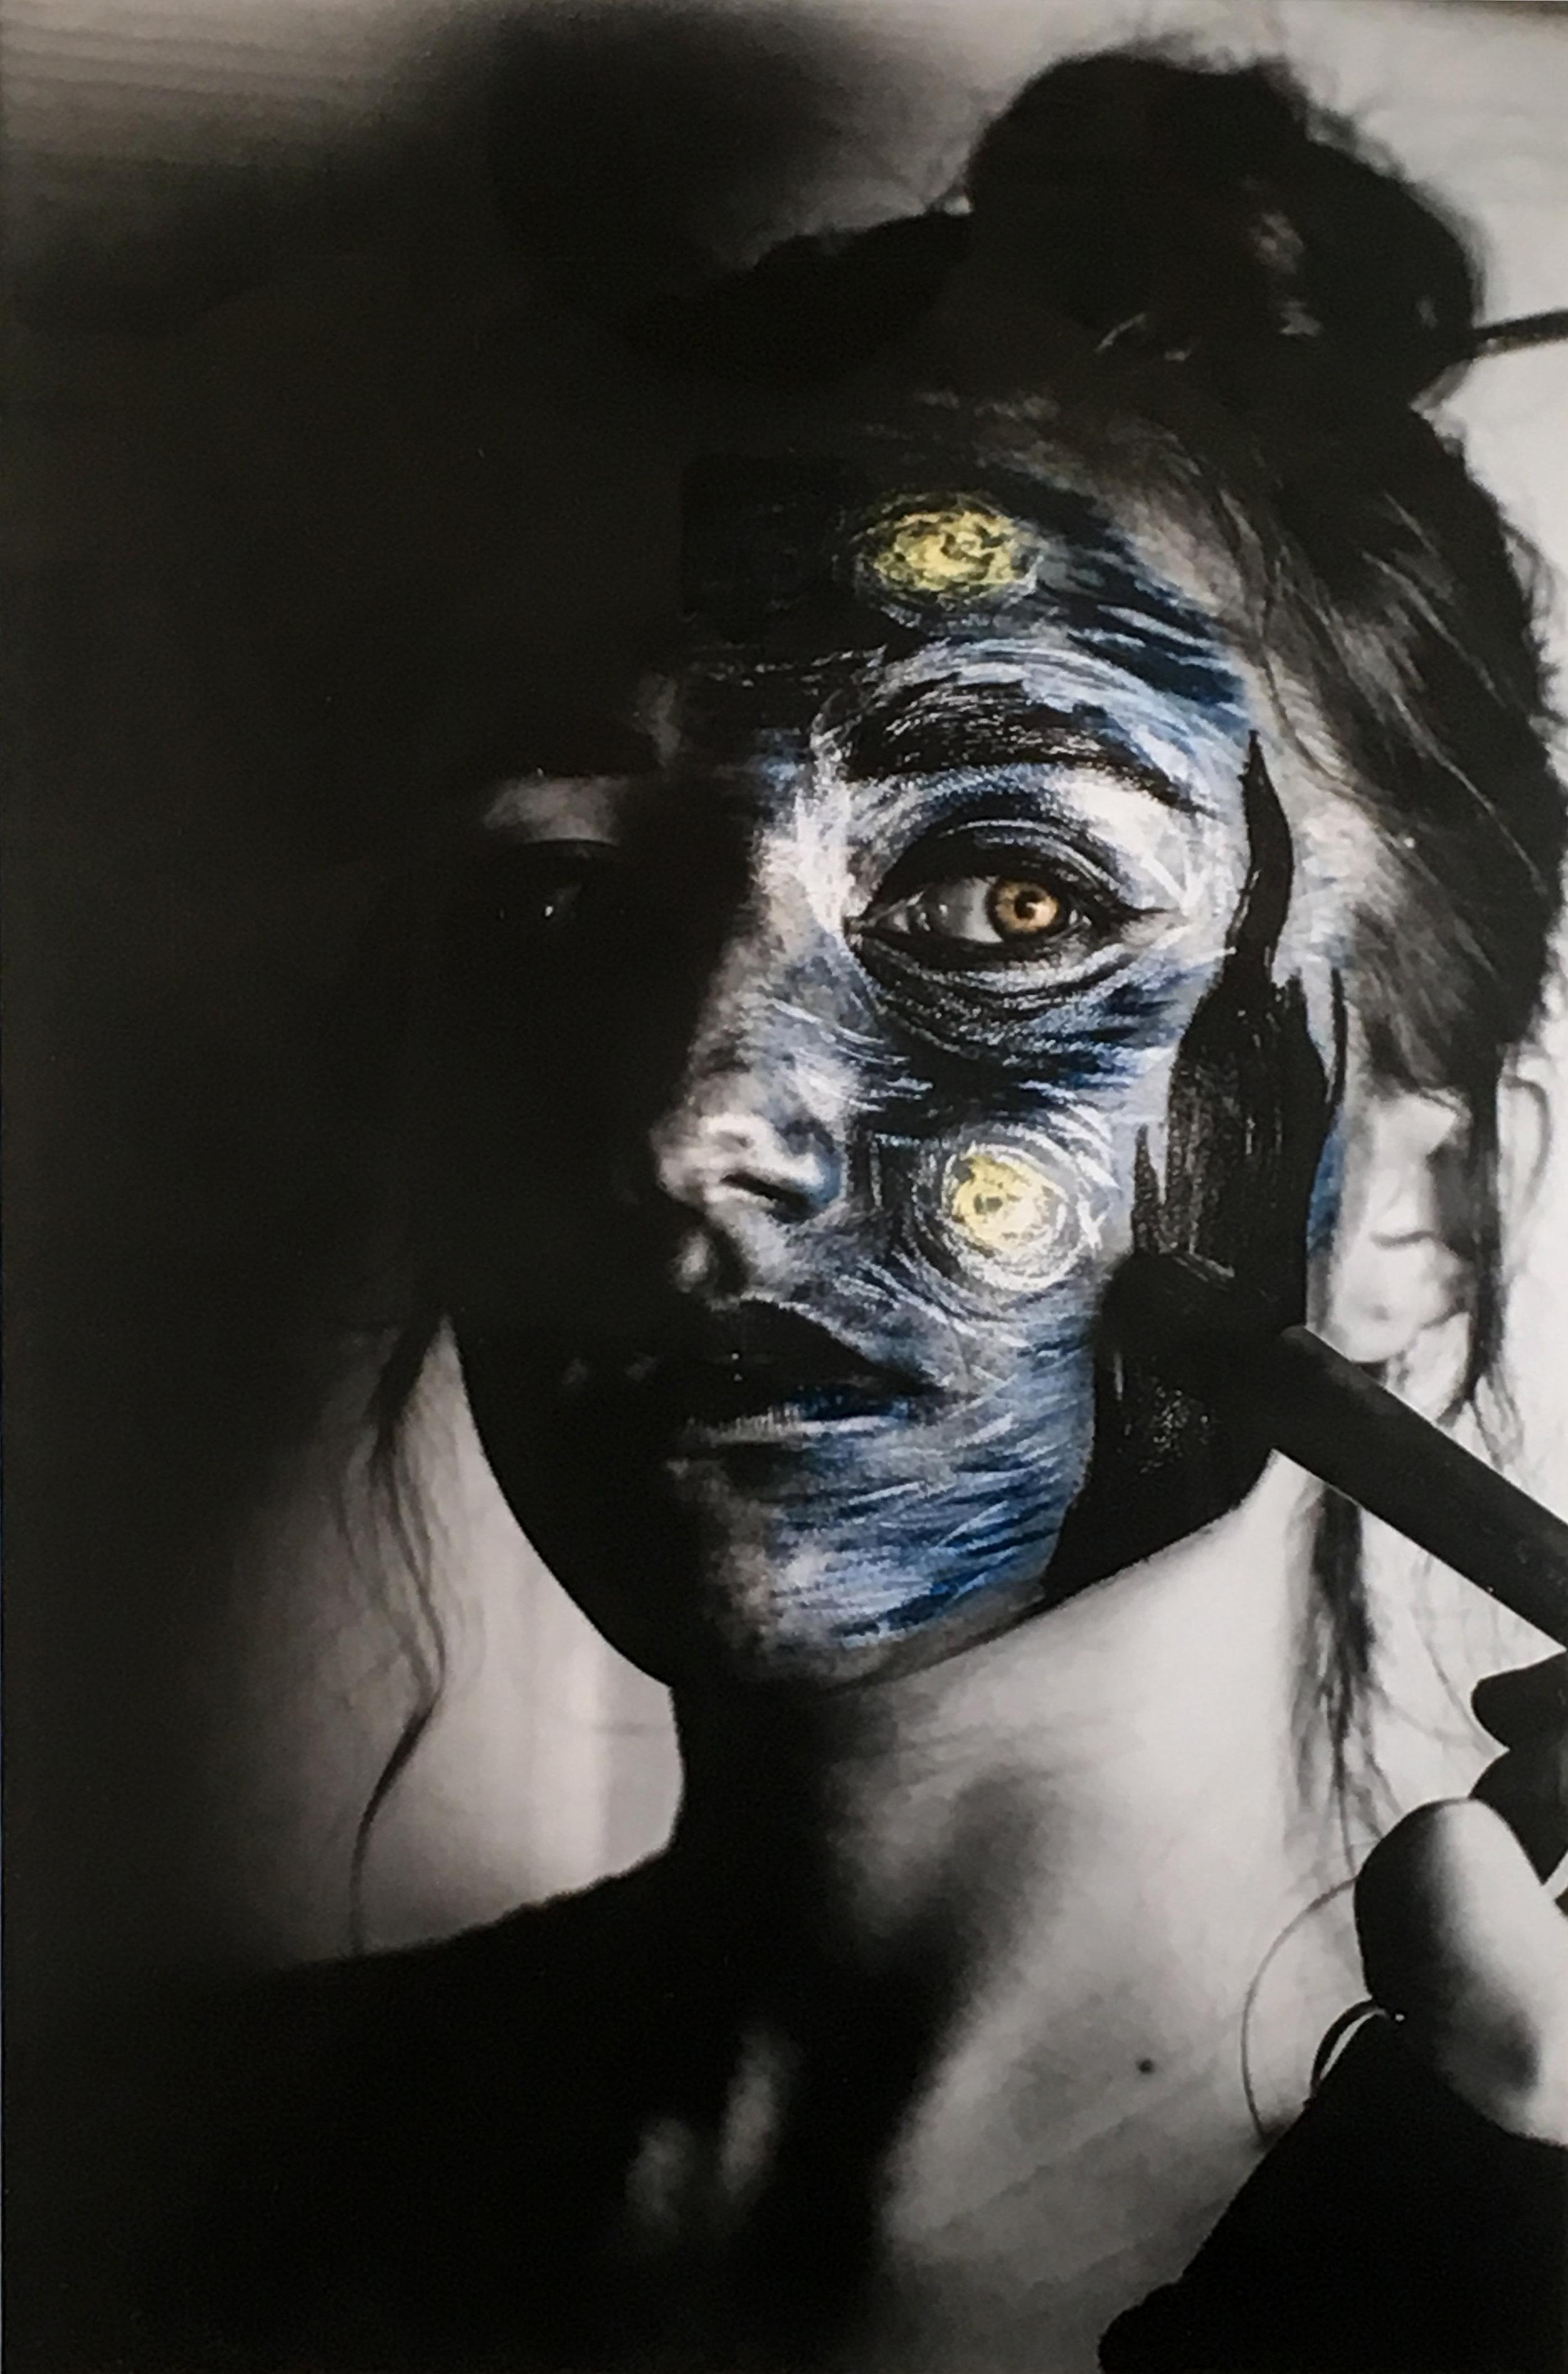 Emma McMillian  Starry Eyes Photography  Cheokee HS 21.5x17.5  Burlington County